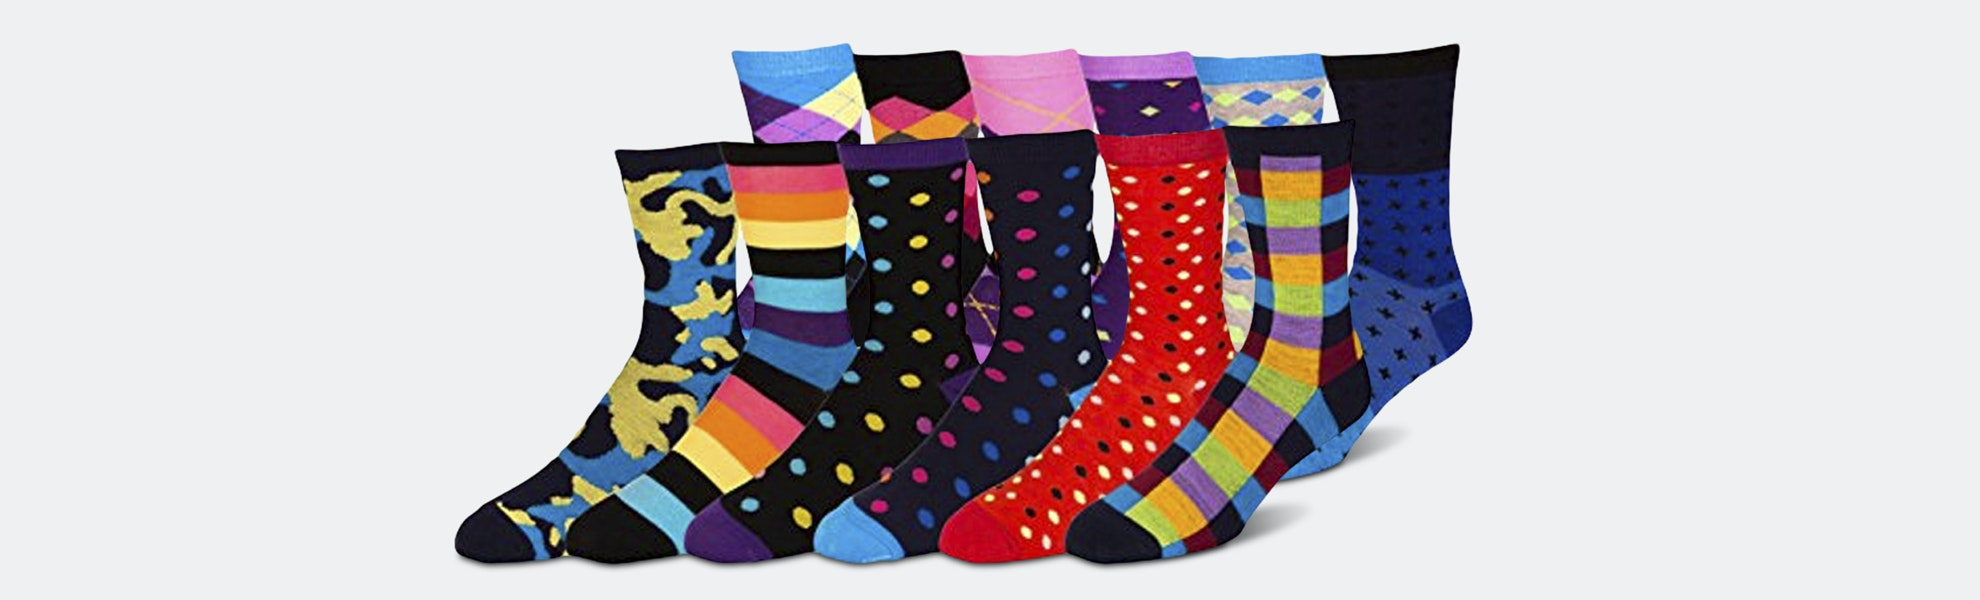 ZEKE Assorted Funky Dress Socks (12-Pack)